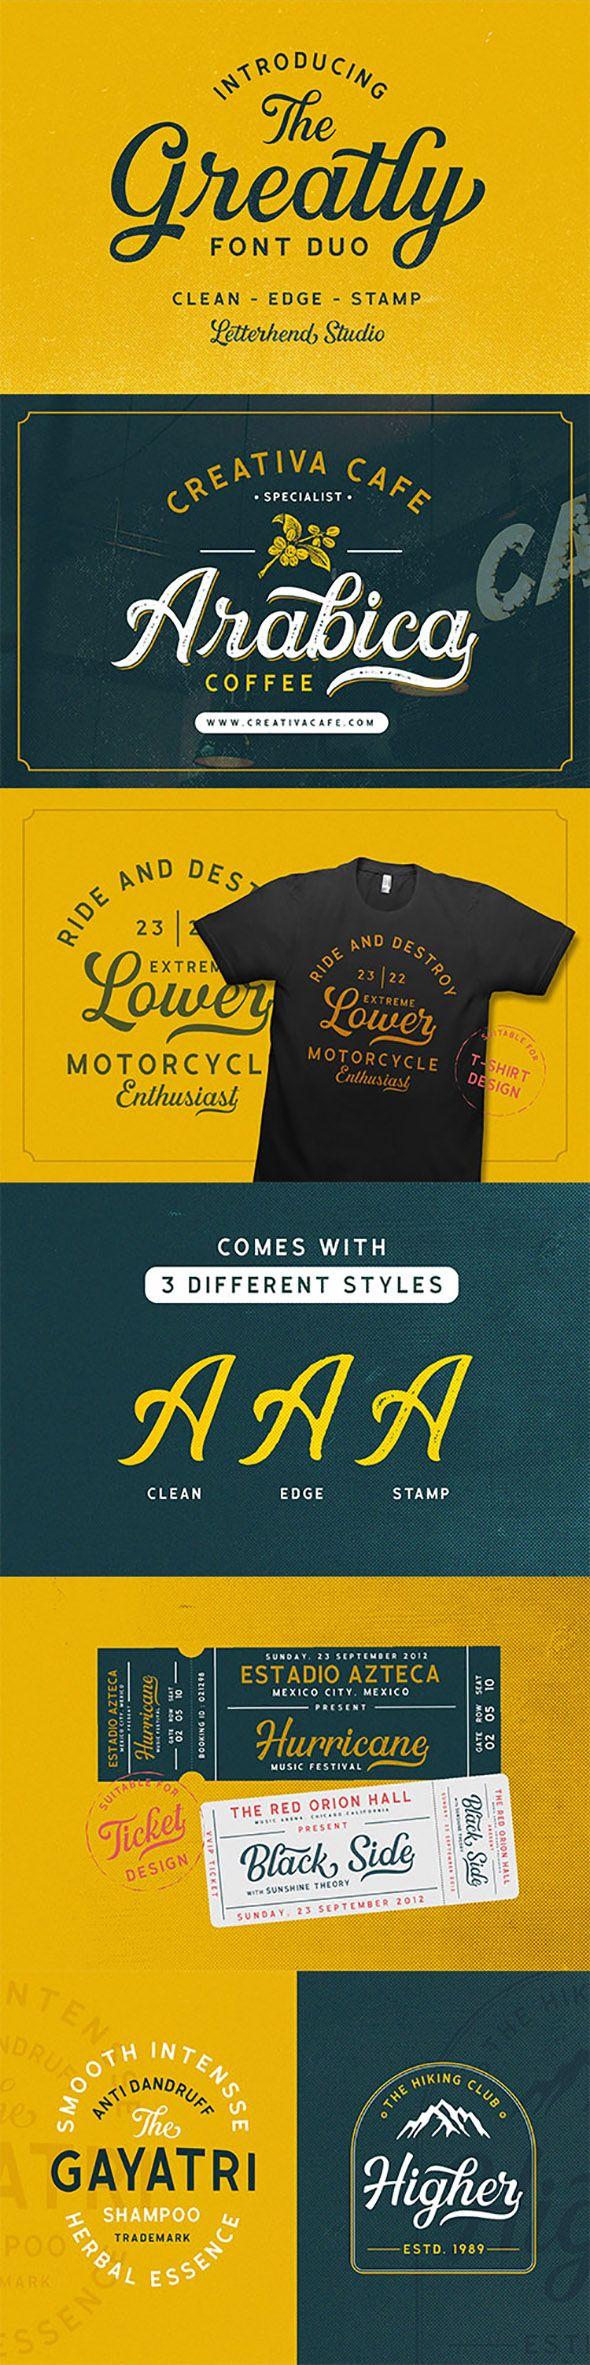 Greatly Font Duo + Logo Templates. Professional font. #font #design #art #digitalArt #webDesign #printDesign #emblem #FontDuo #label #LogoTemplates #retro #typeface #vintage